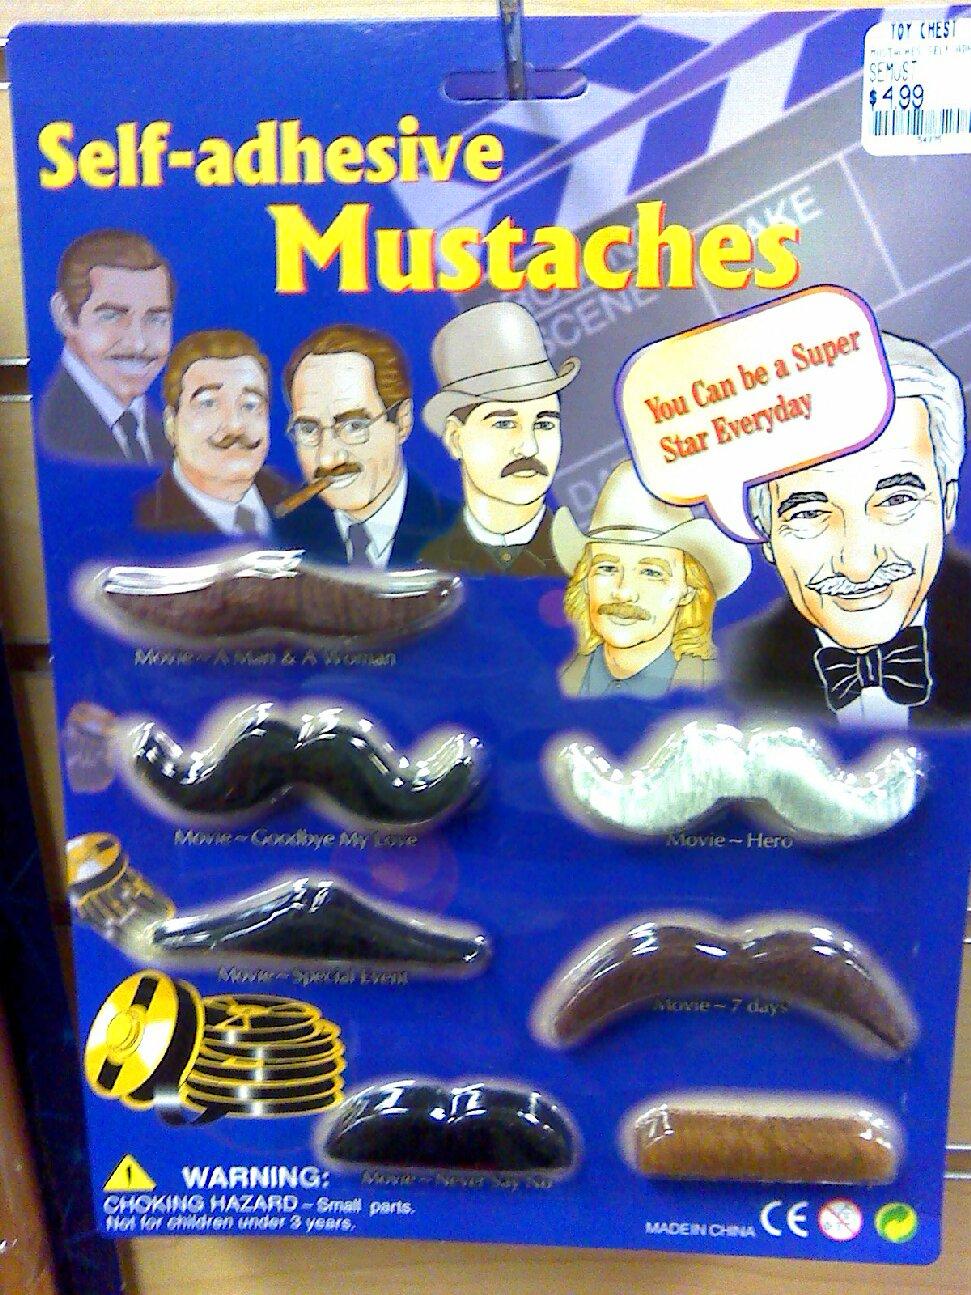 Mustache Secrets REVEALED